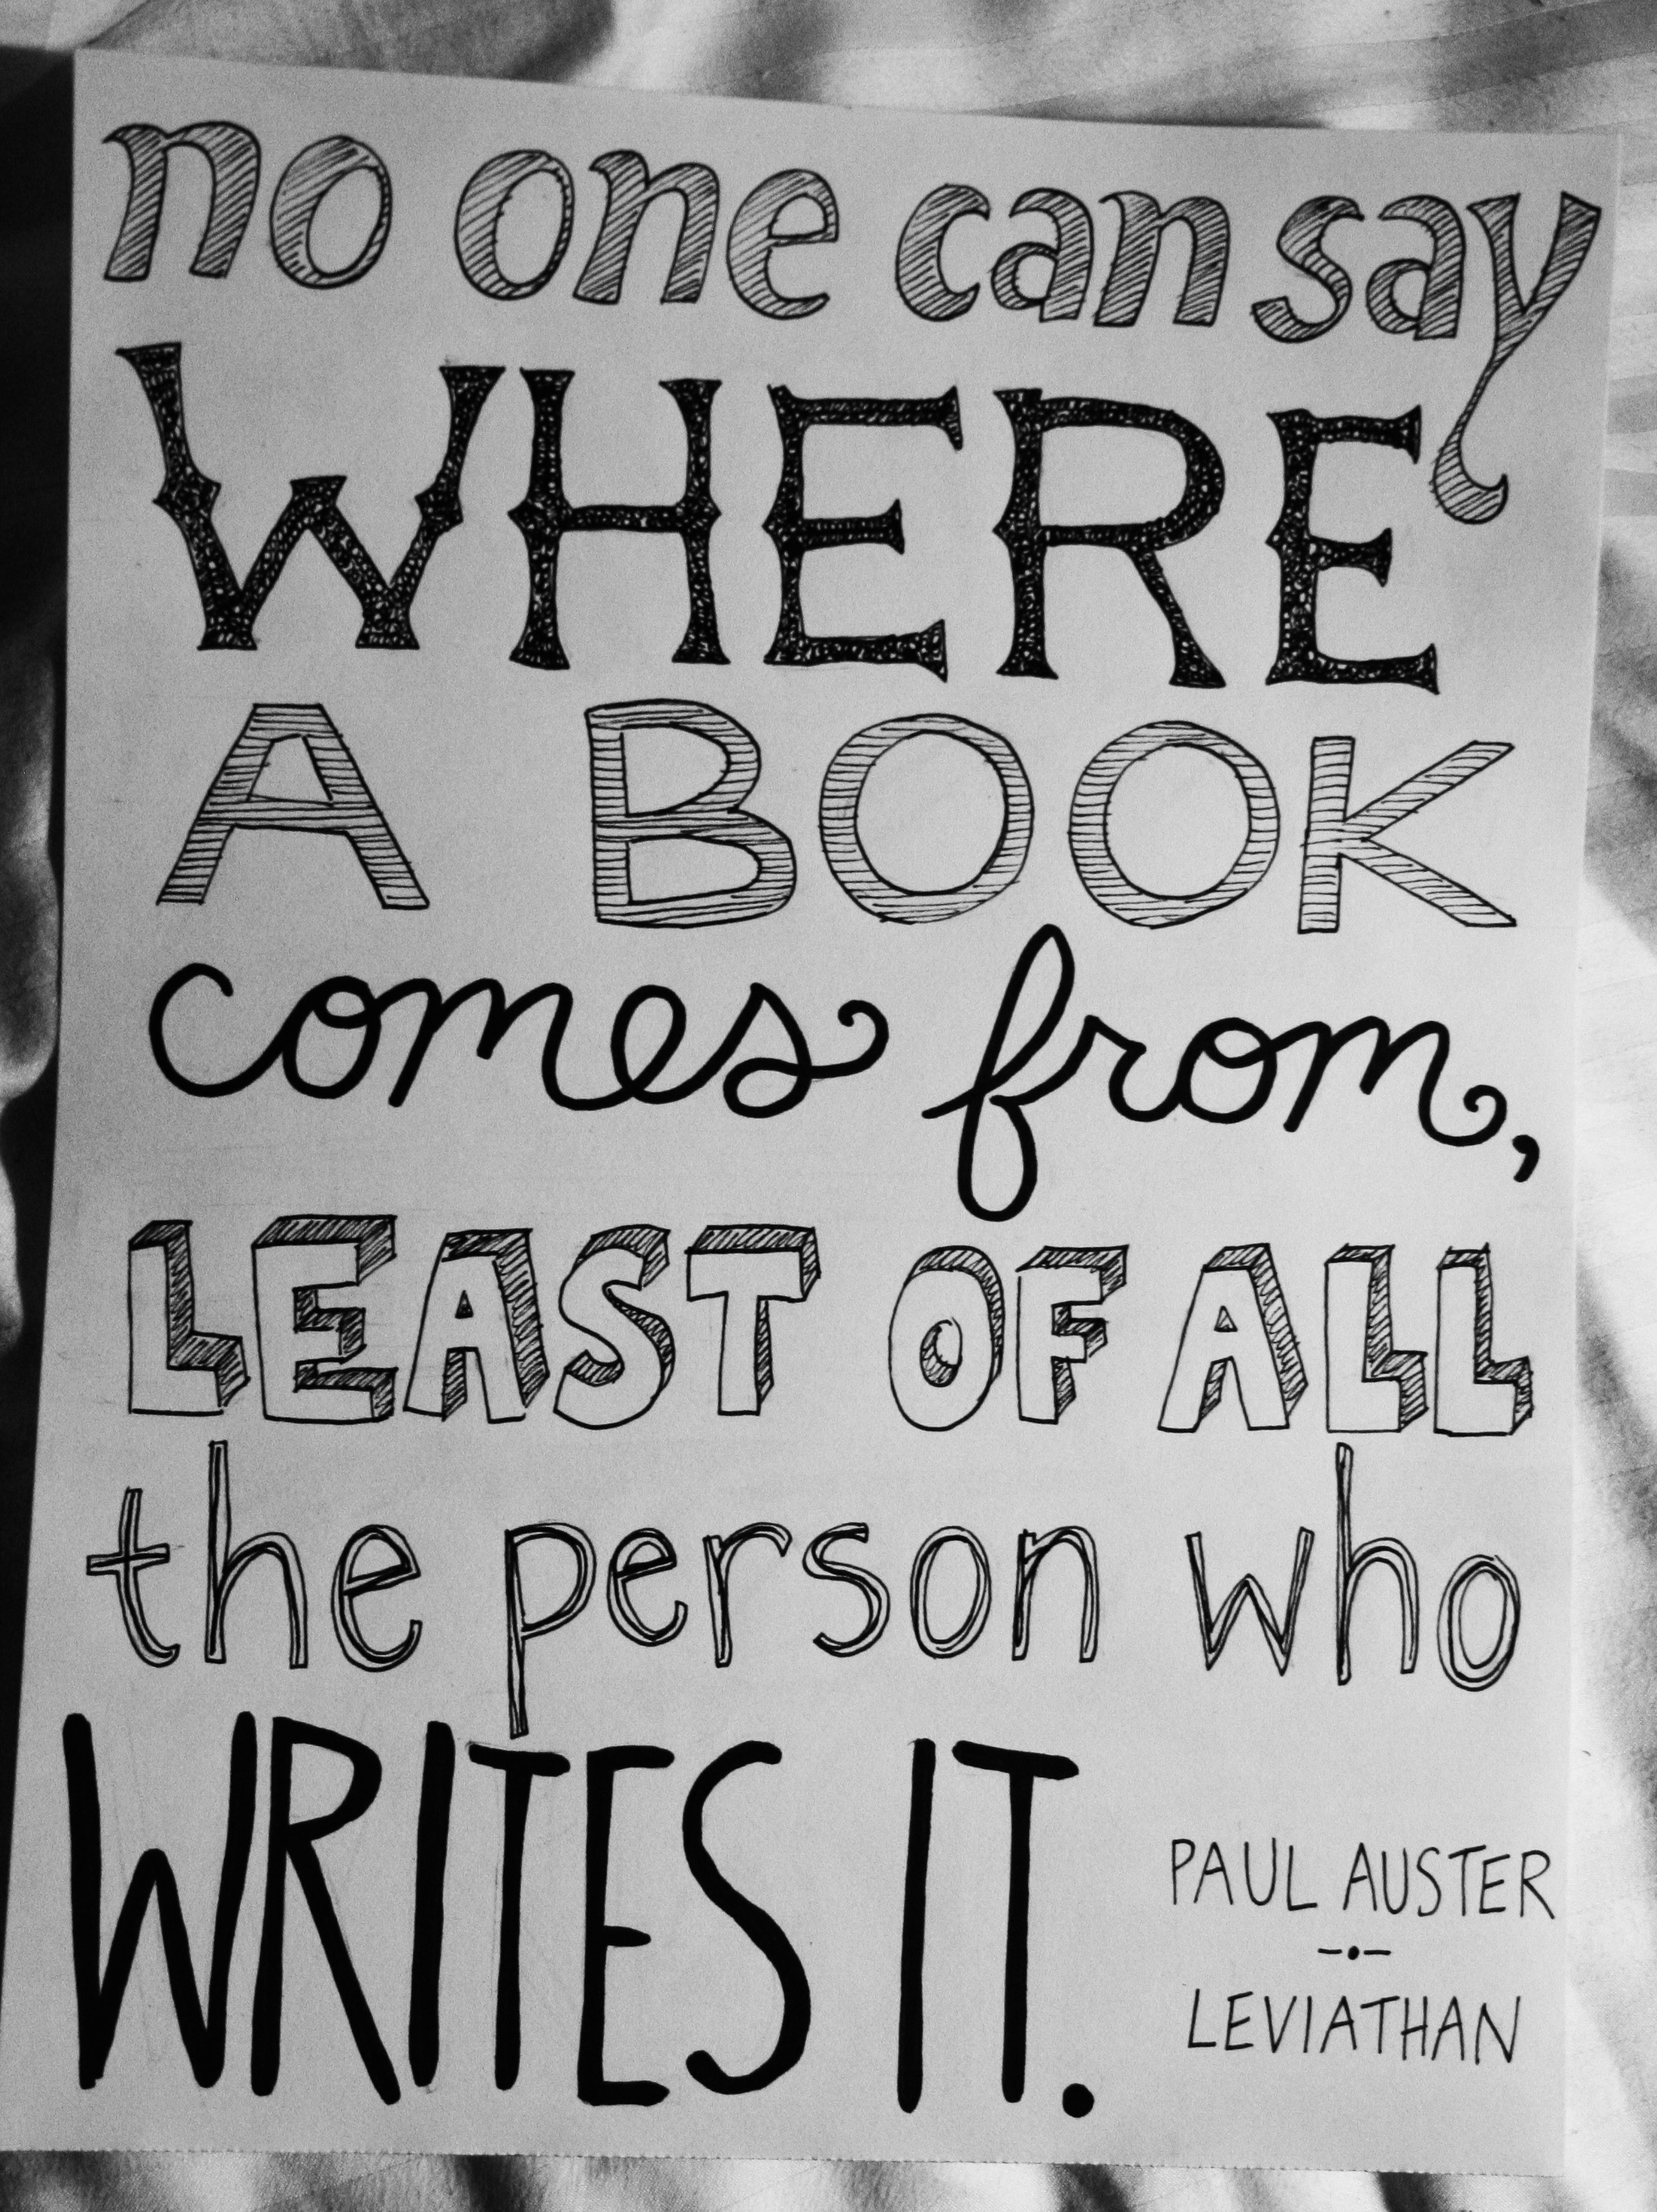 Paul Auster's quote #7